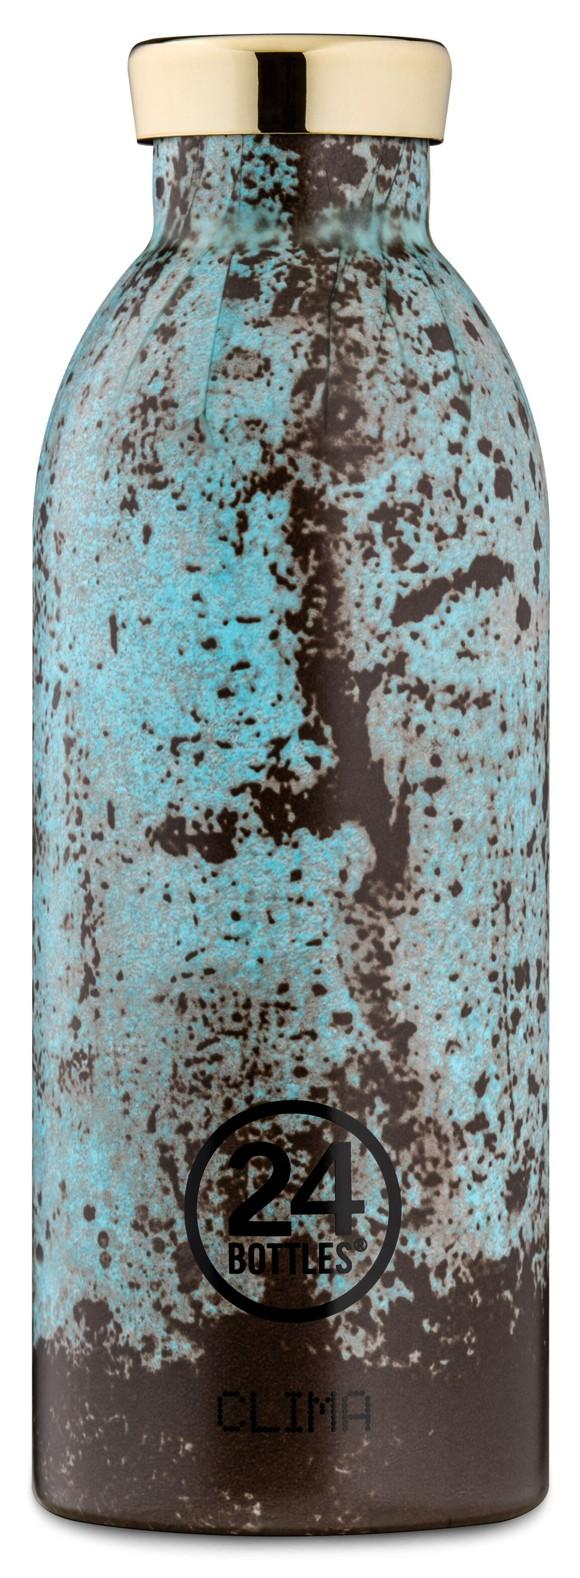 24 Bottles - Clima Bottle 0,5 L - Riace (24B194)